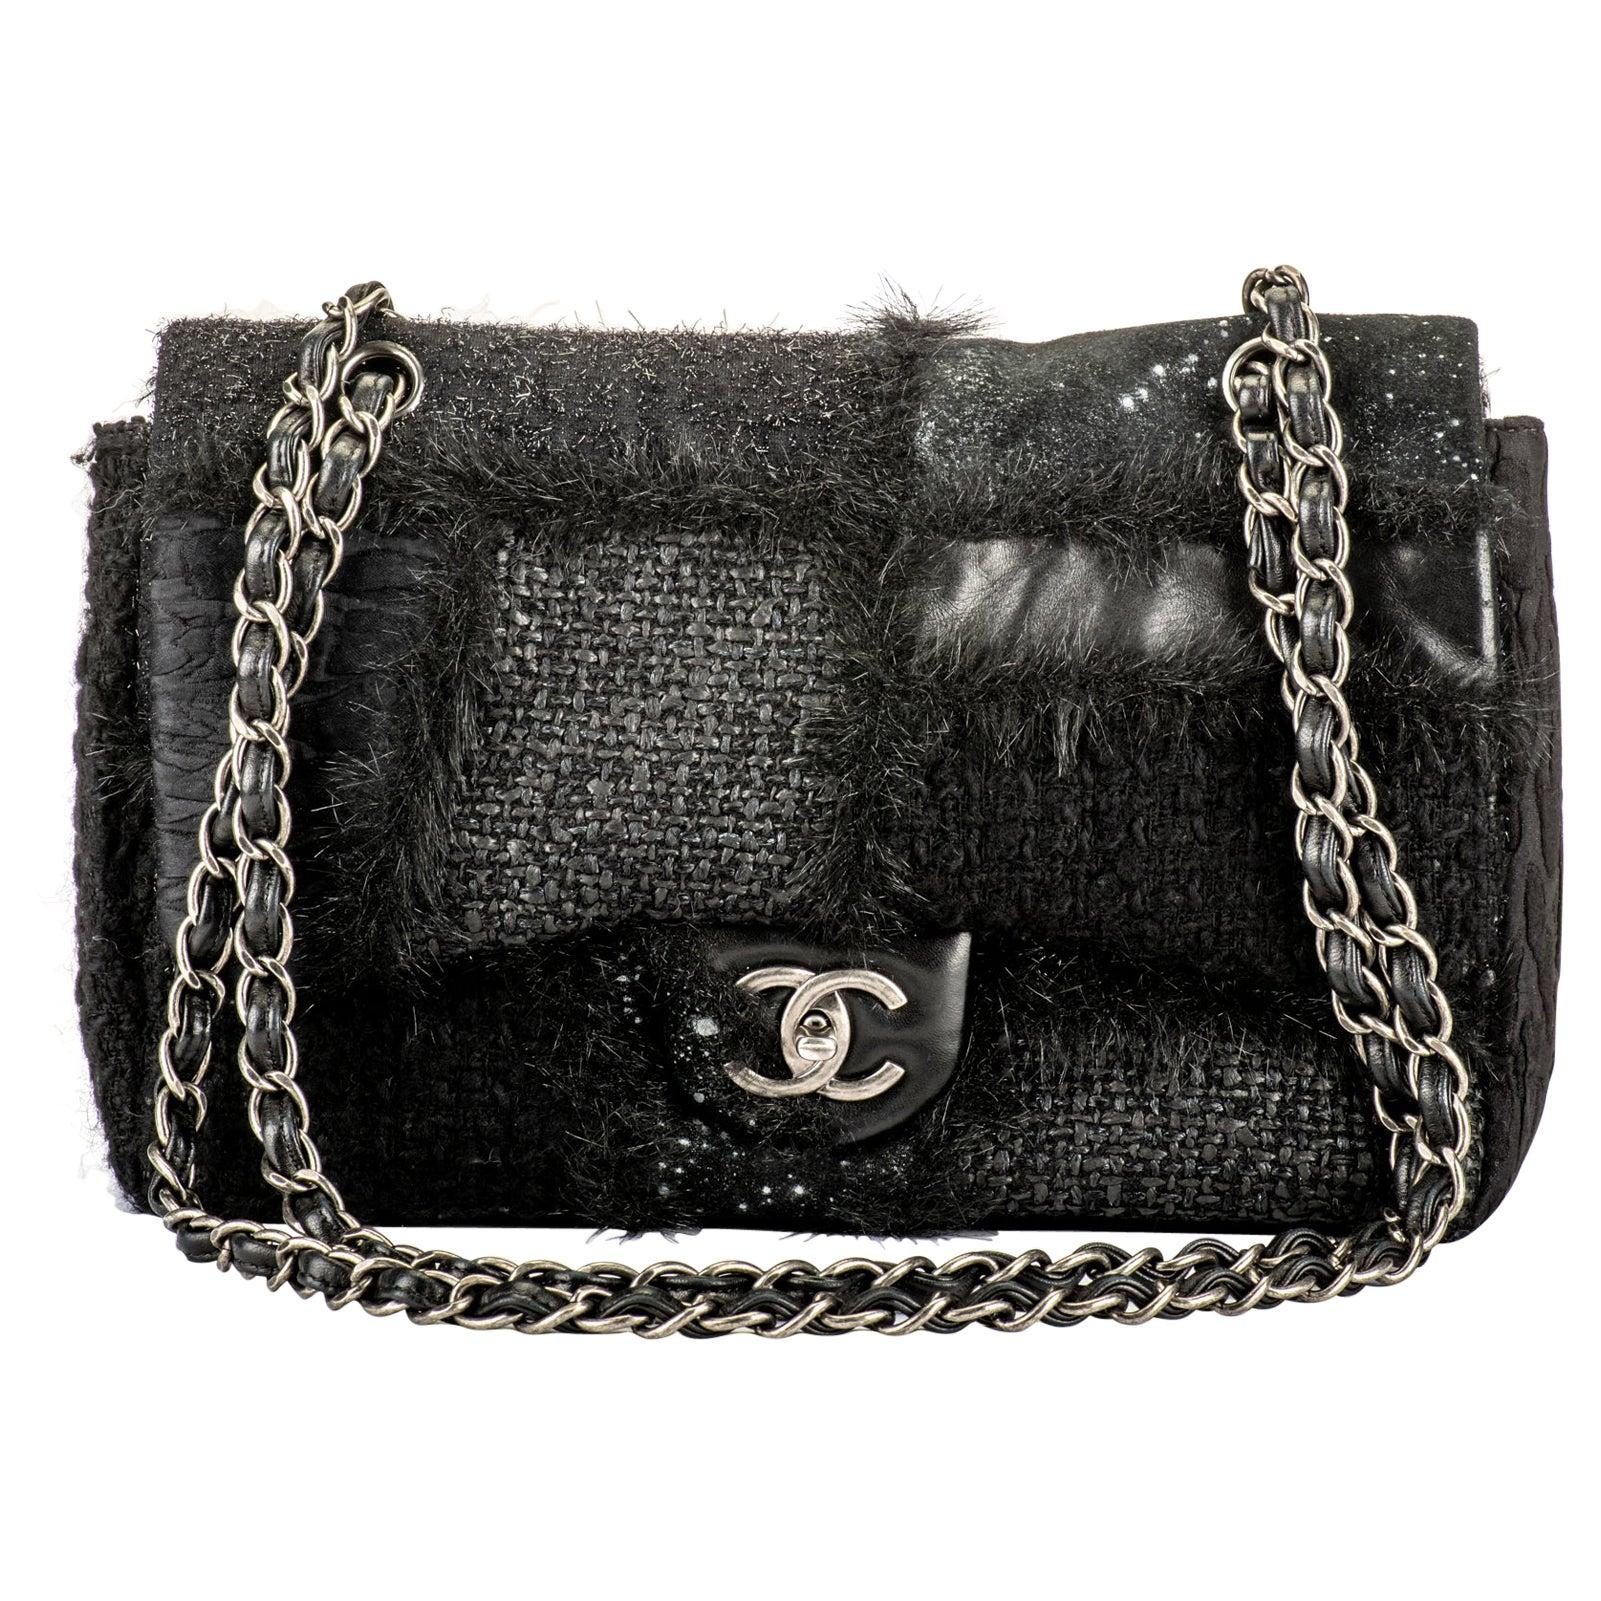 Chanel Limited Edition Black Patchwork Jumbo Bag